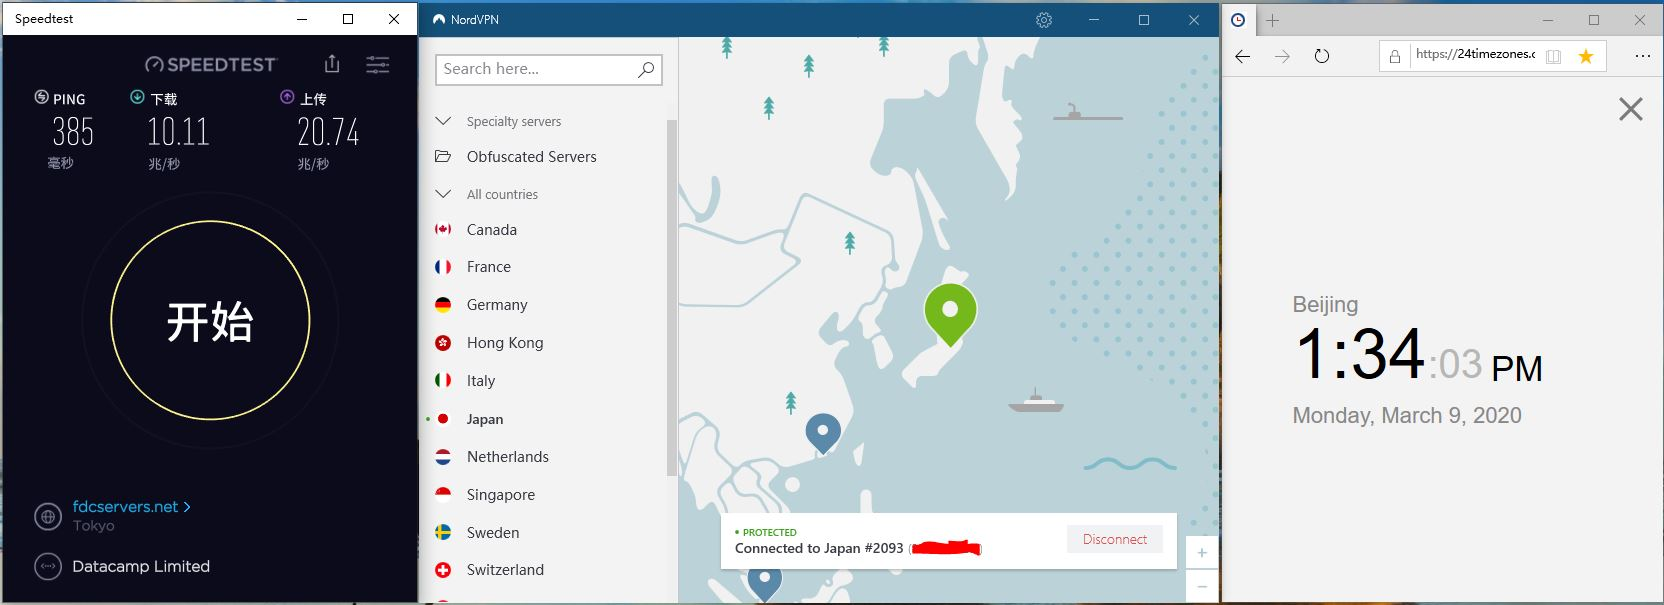 Windows10 NordVPN Japan #2093 中国VPN翻墙 科学上网 SpeedTest测速 - 20200309